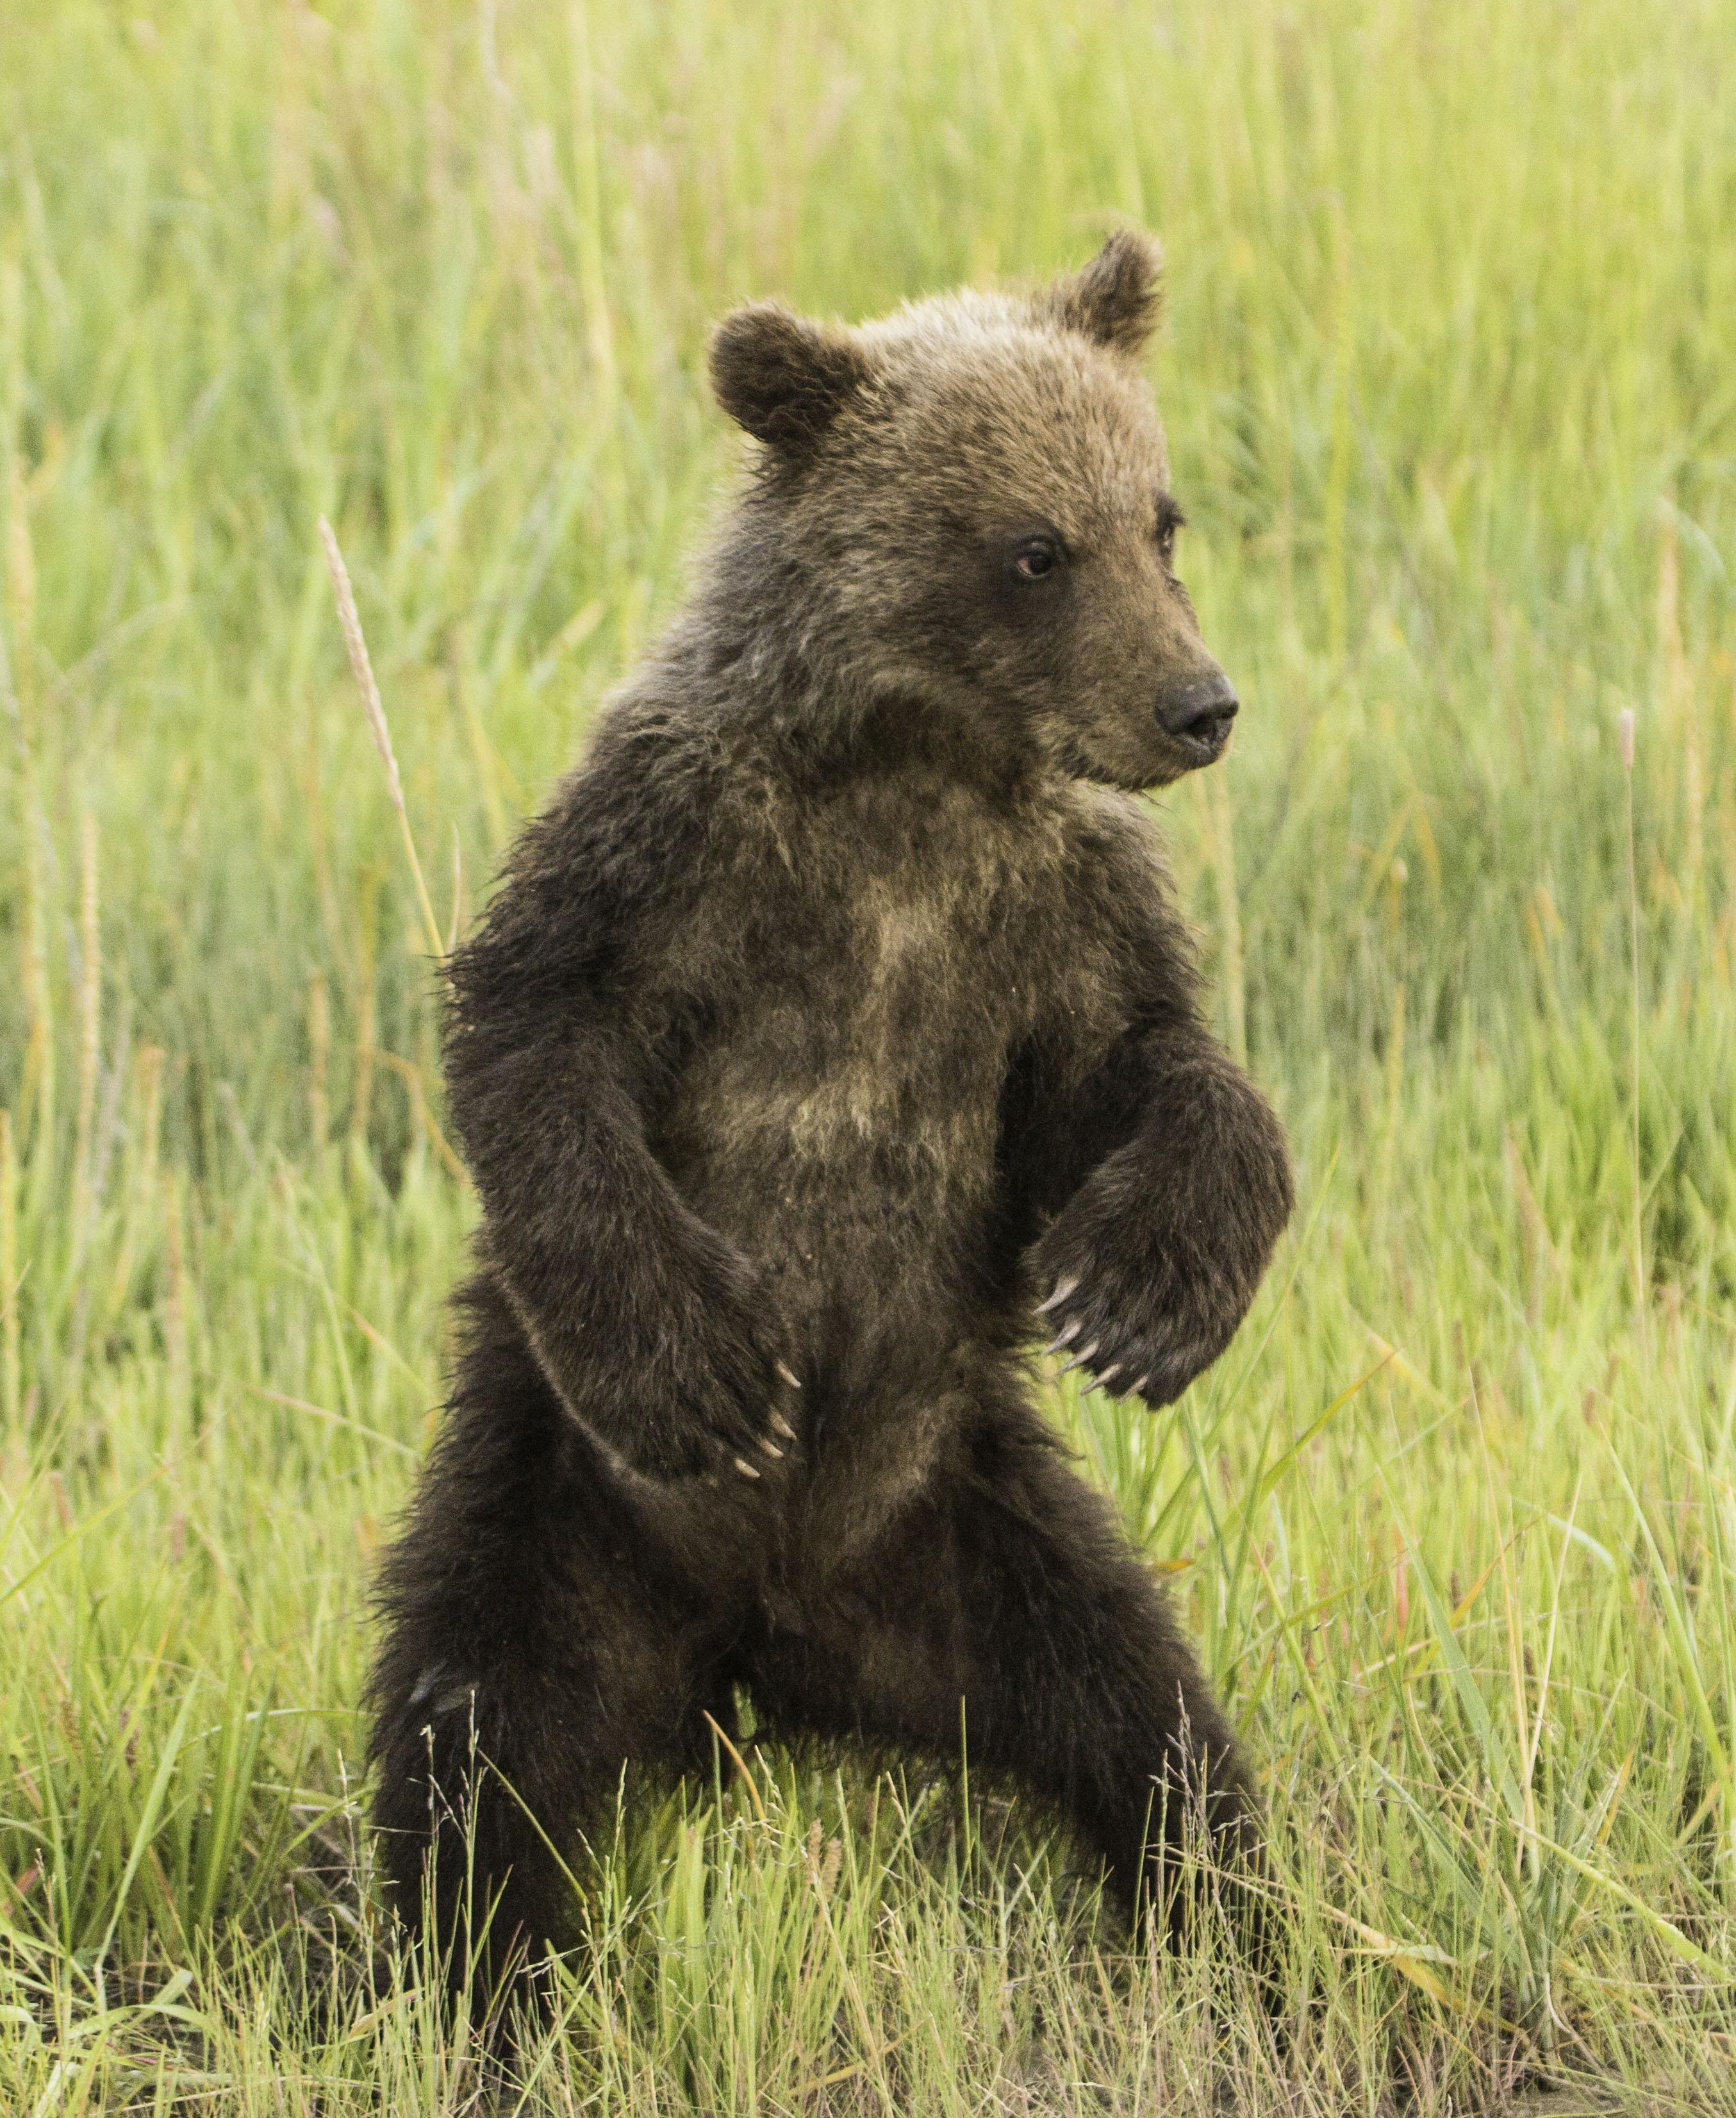 Grizzly Bear Cub in Tall Grass Lake Clark National Park Alaska